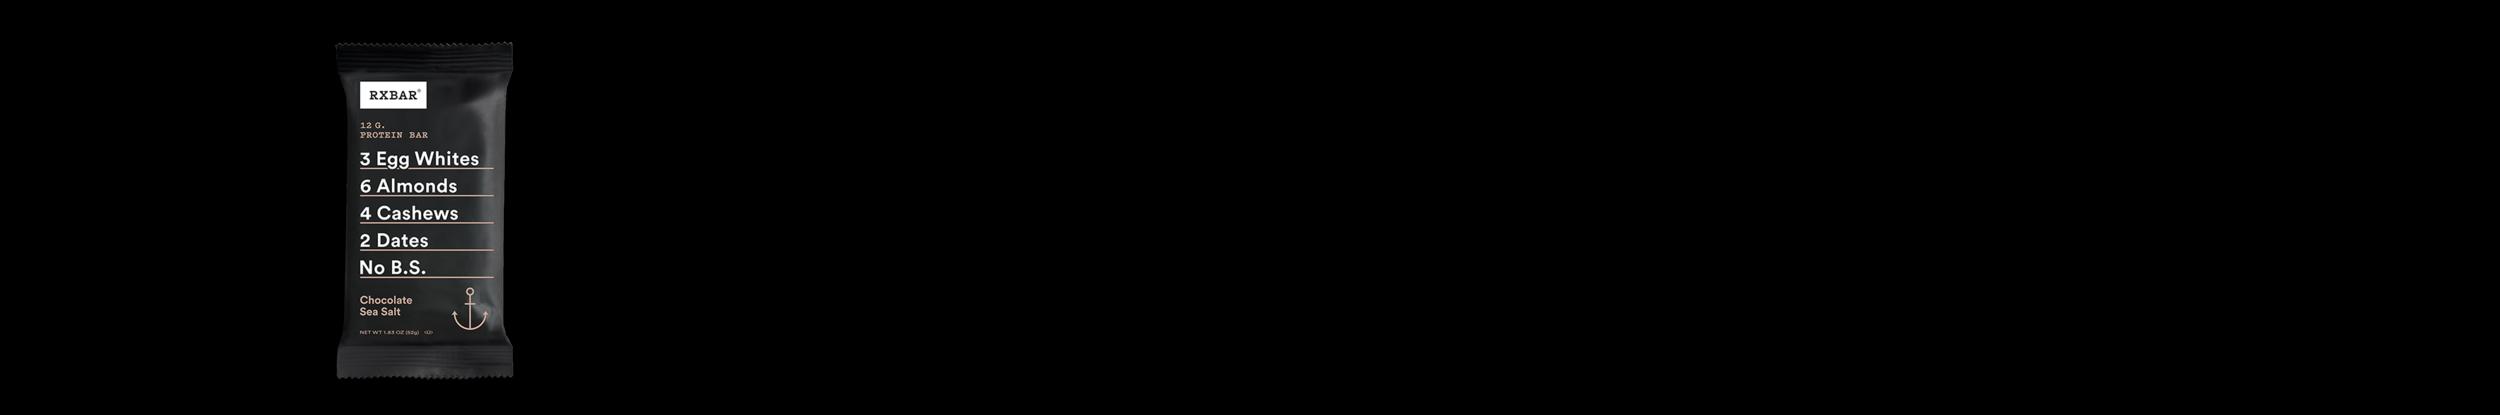 Macros RXBAR.png